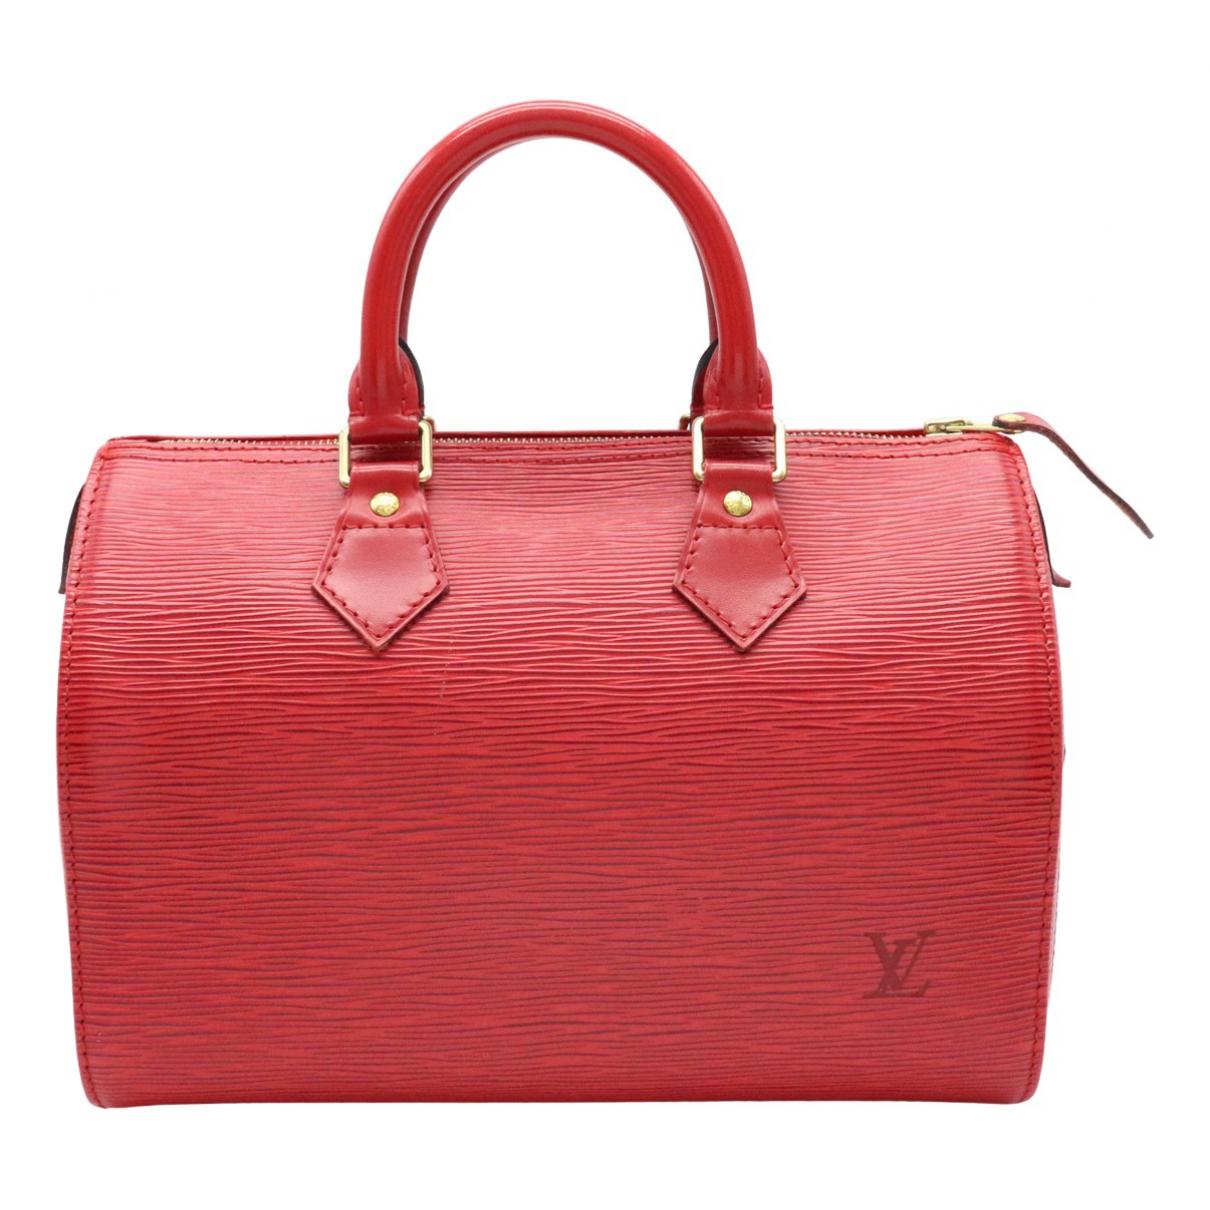 Louis Vuitton Speedy Red Leather handbag for Women N